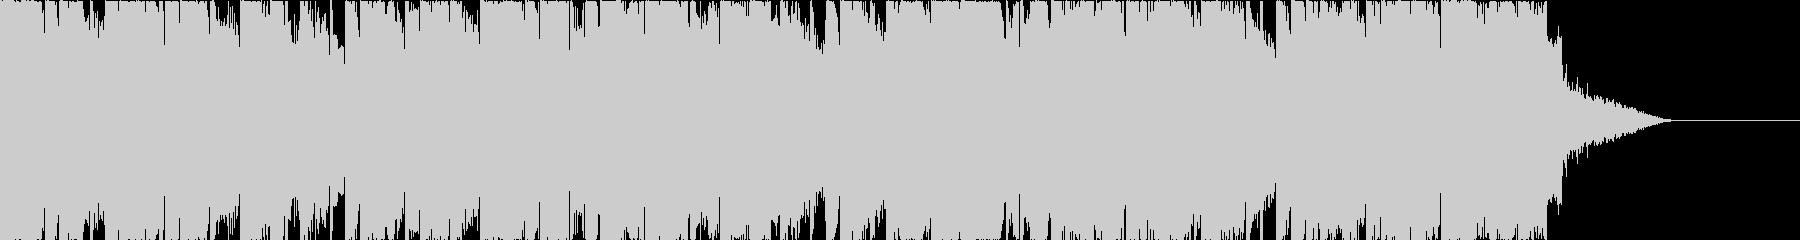 POPなBGMの未再生の波形